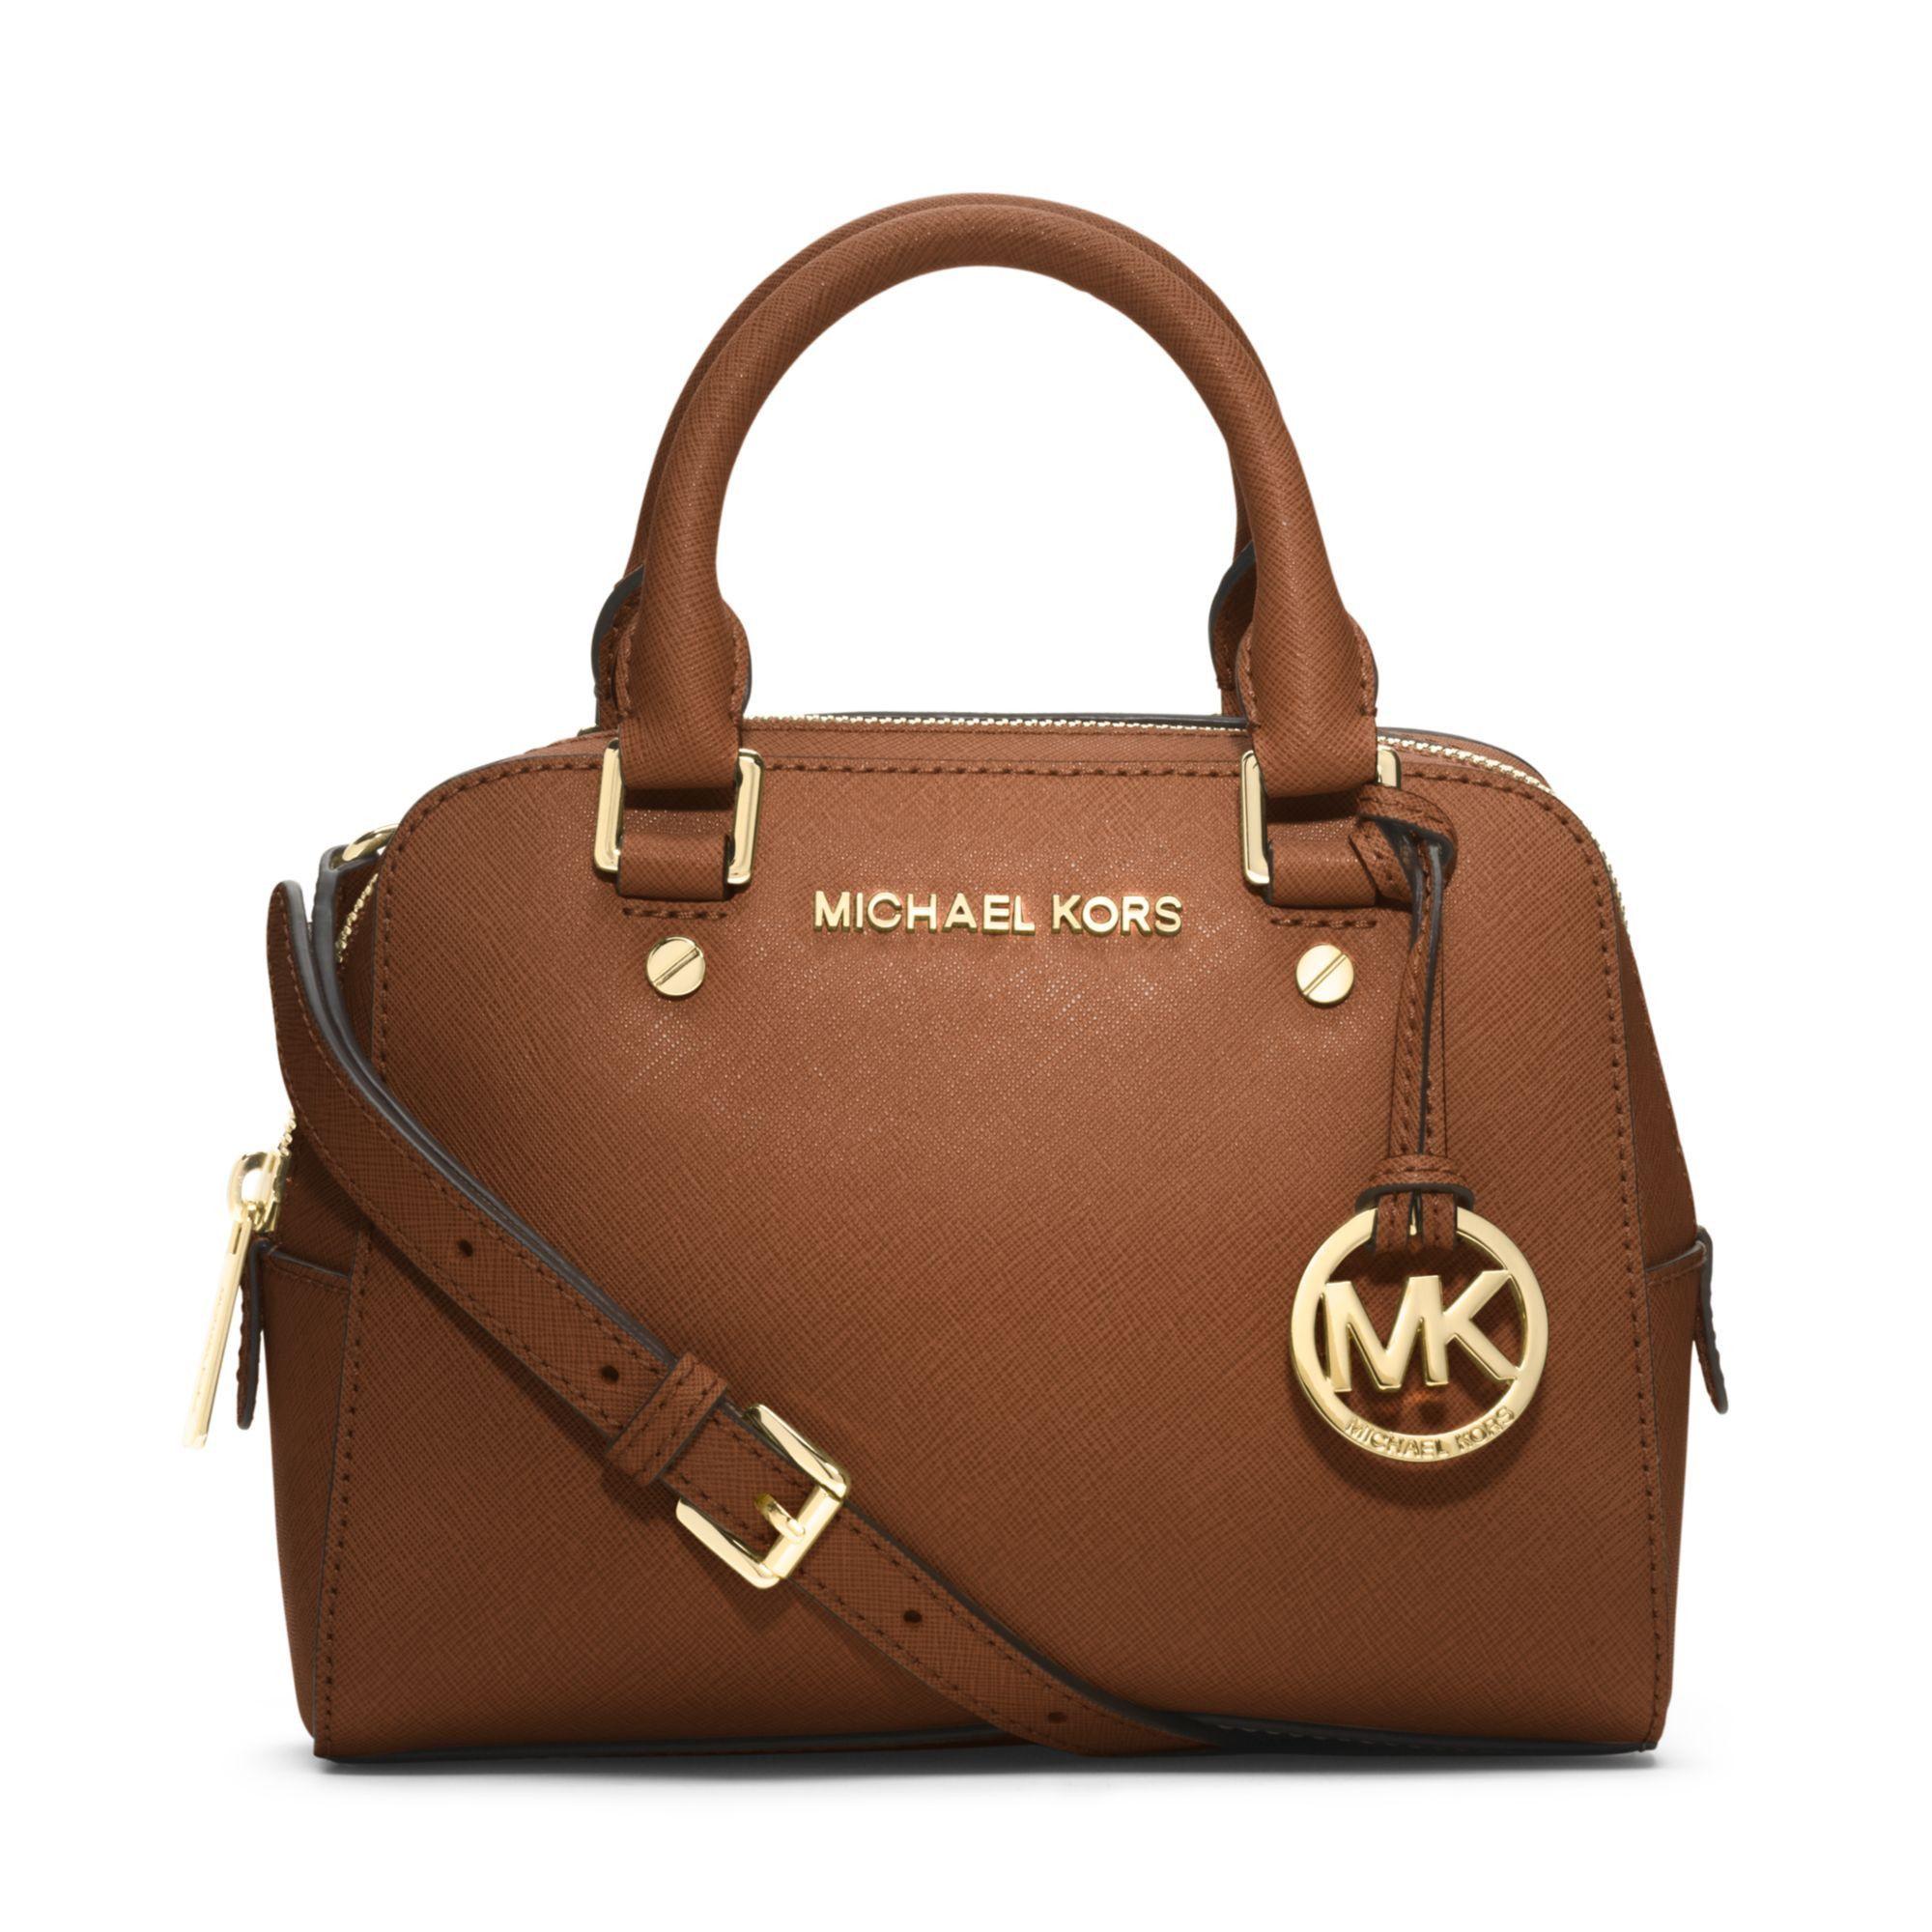 michael michael kors small jet set travel satchel in luggage brown rh pinterest com